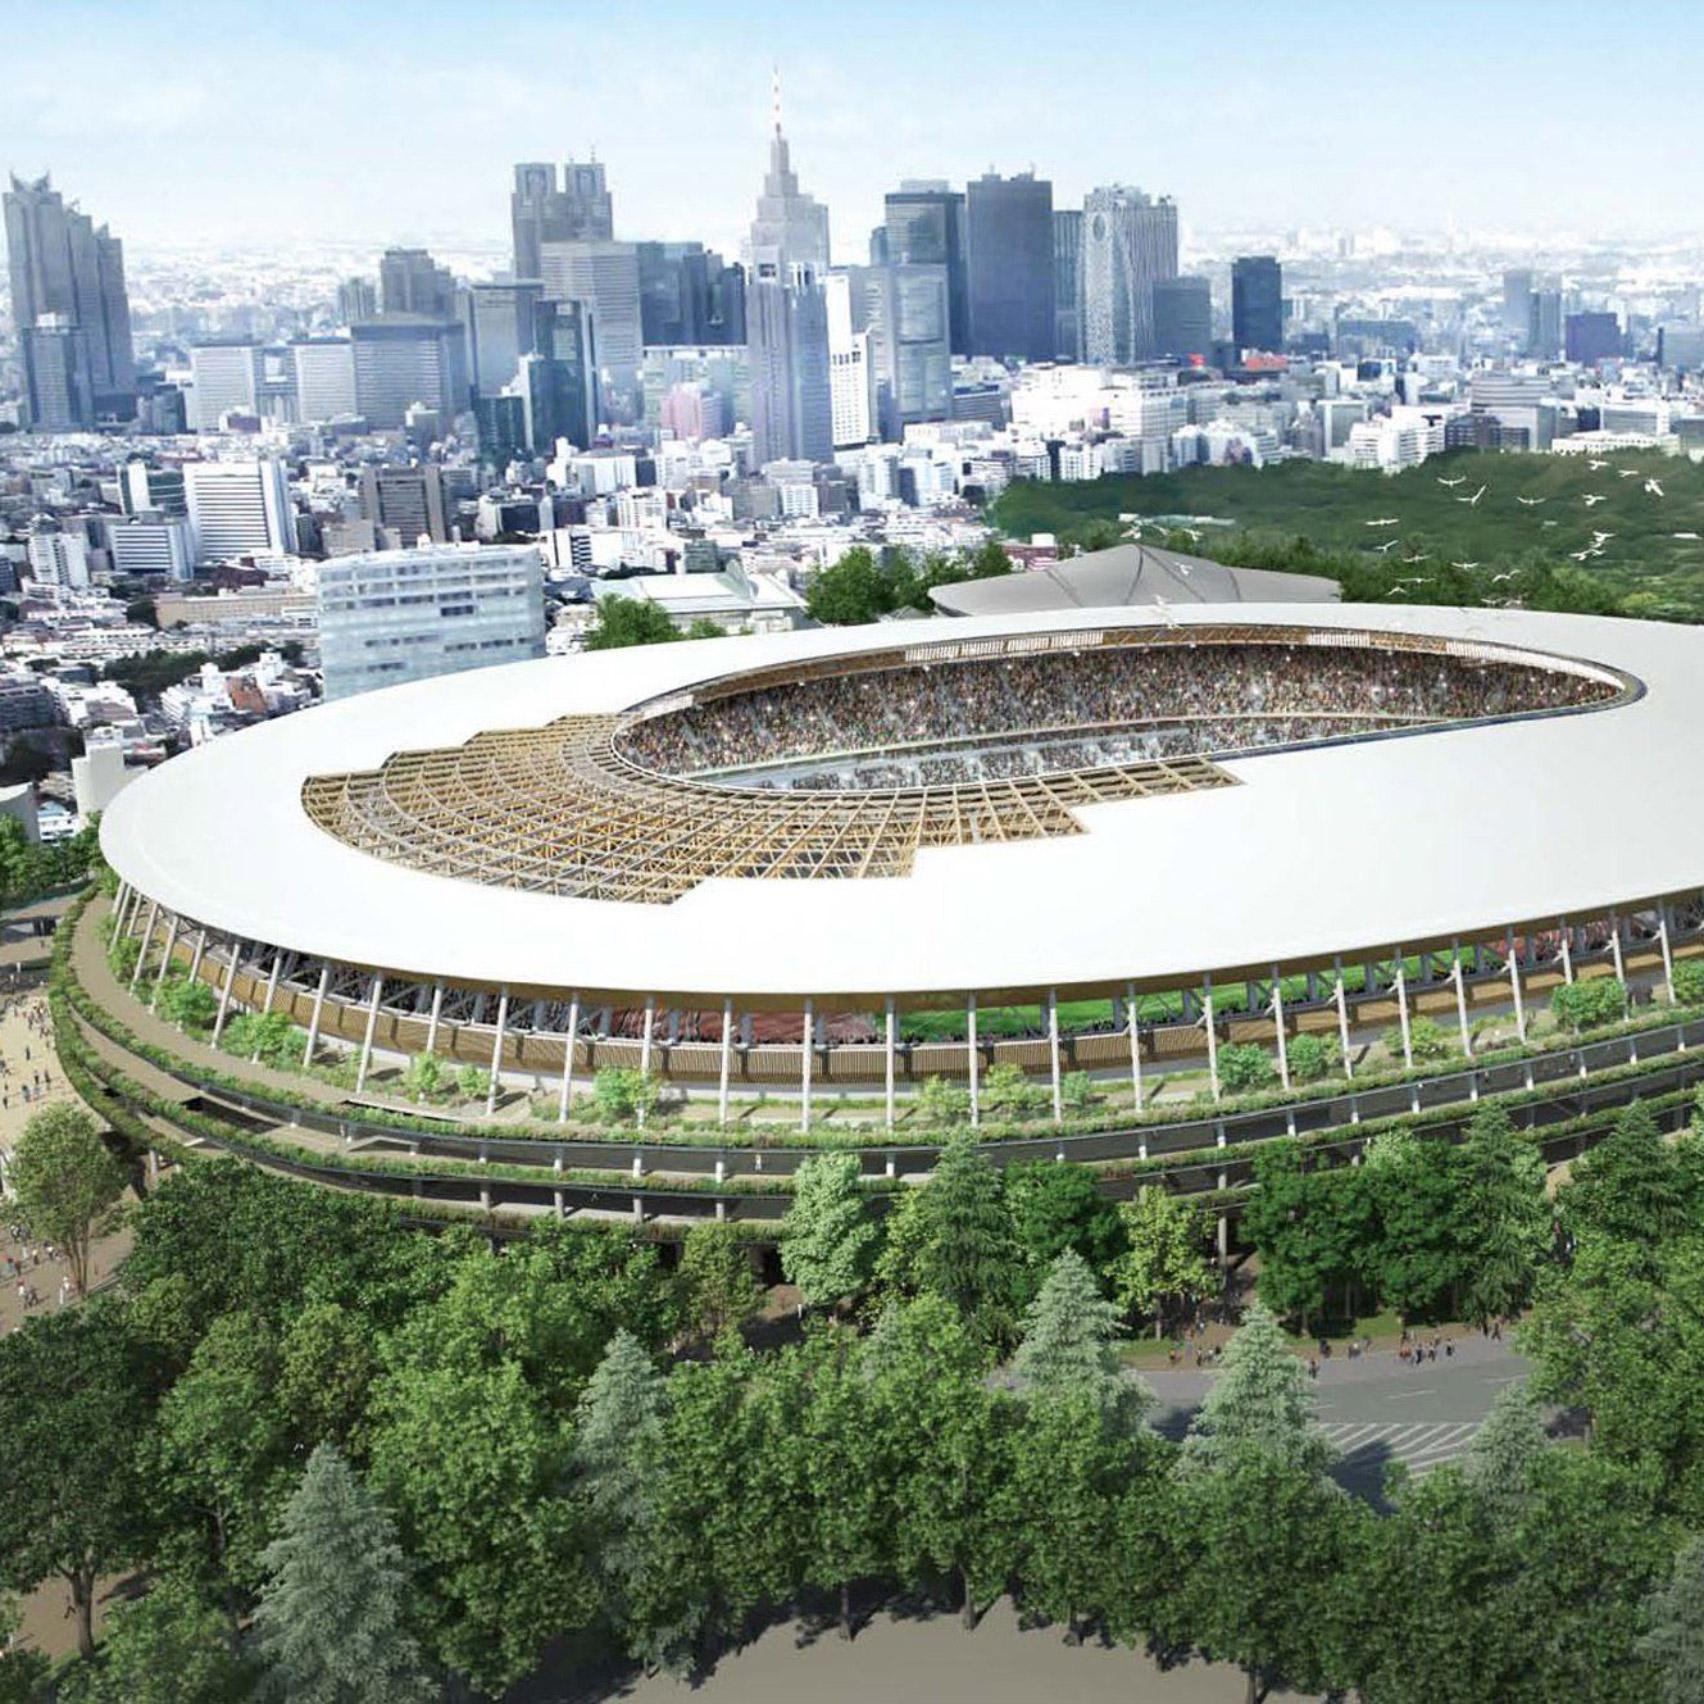 12 new buildings to look forward to in 2020: Japan Tokyo 2020 stadium